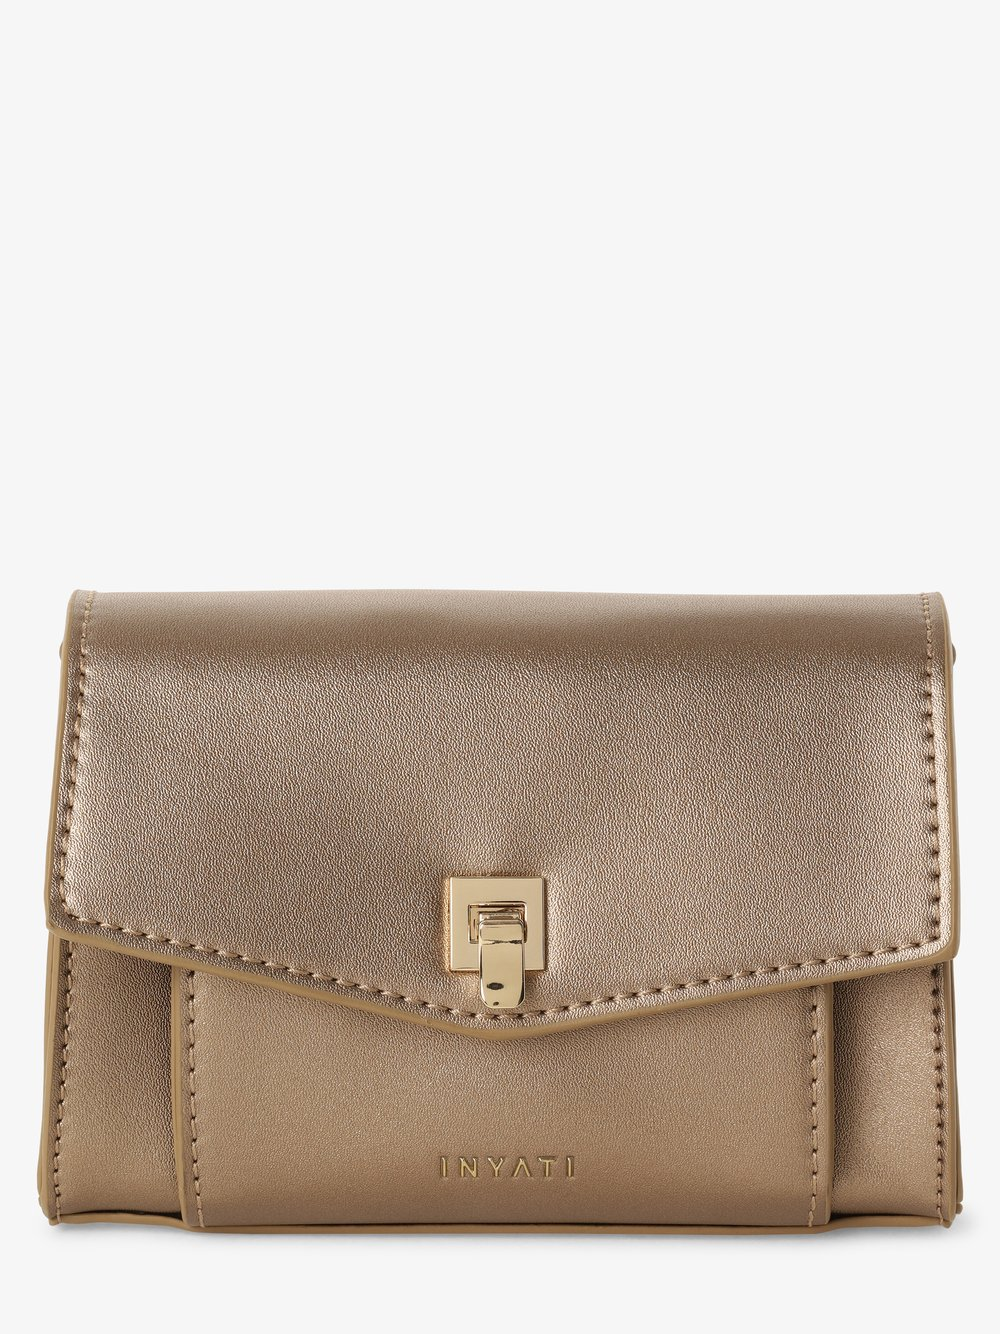 Inyati – Damska torebka na ramię, złoty Van Graaf 442913-0001-00000